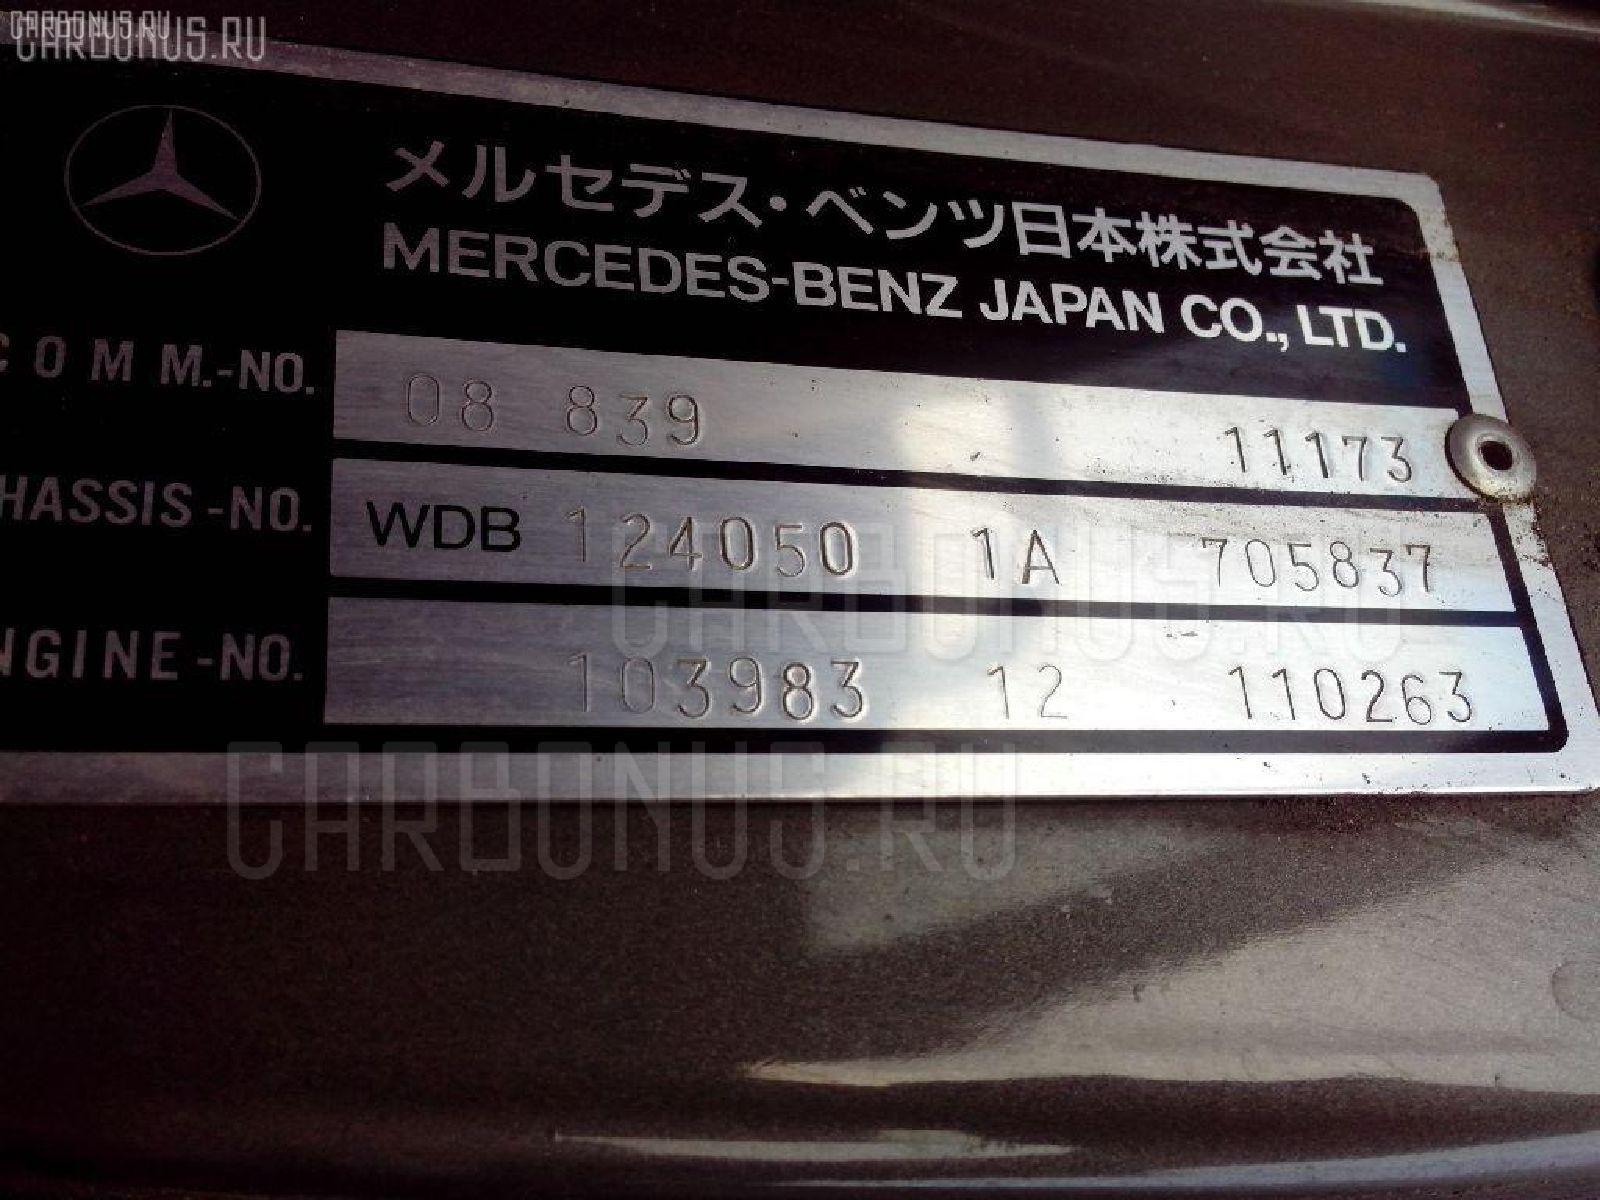 Рычаг стояночного тормоза MERCEDES-BENZ COUPE C124.050 Фото 6